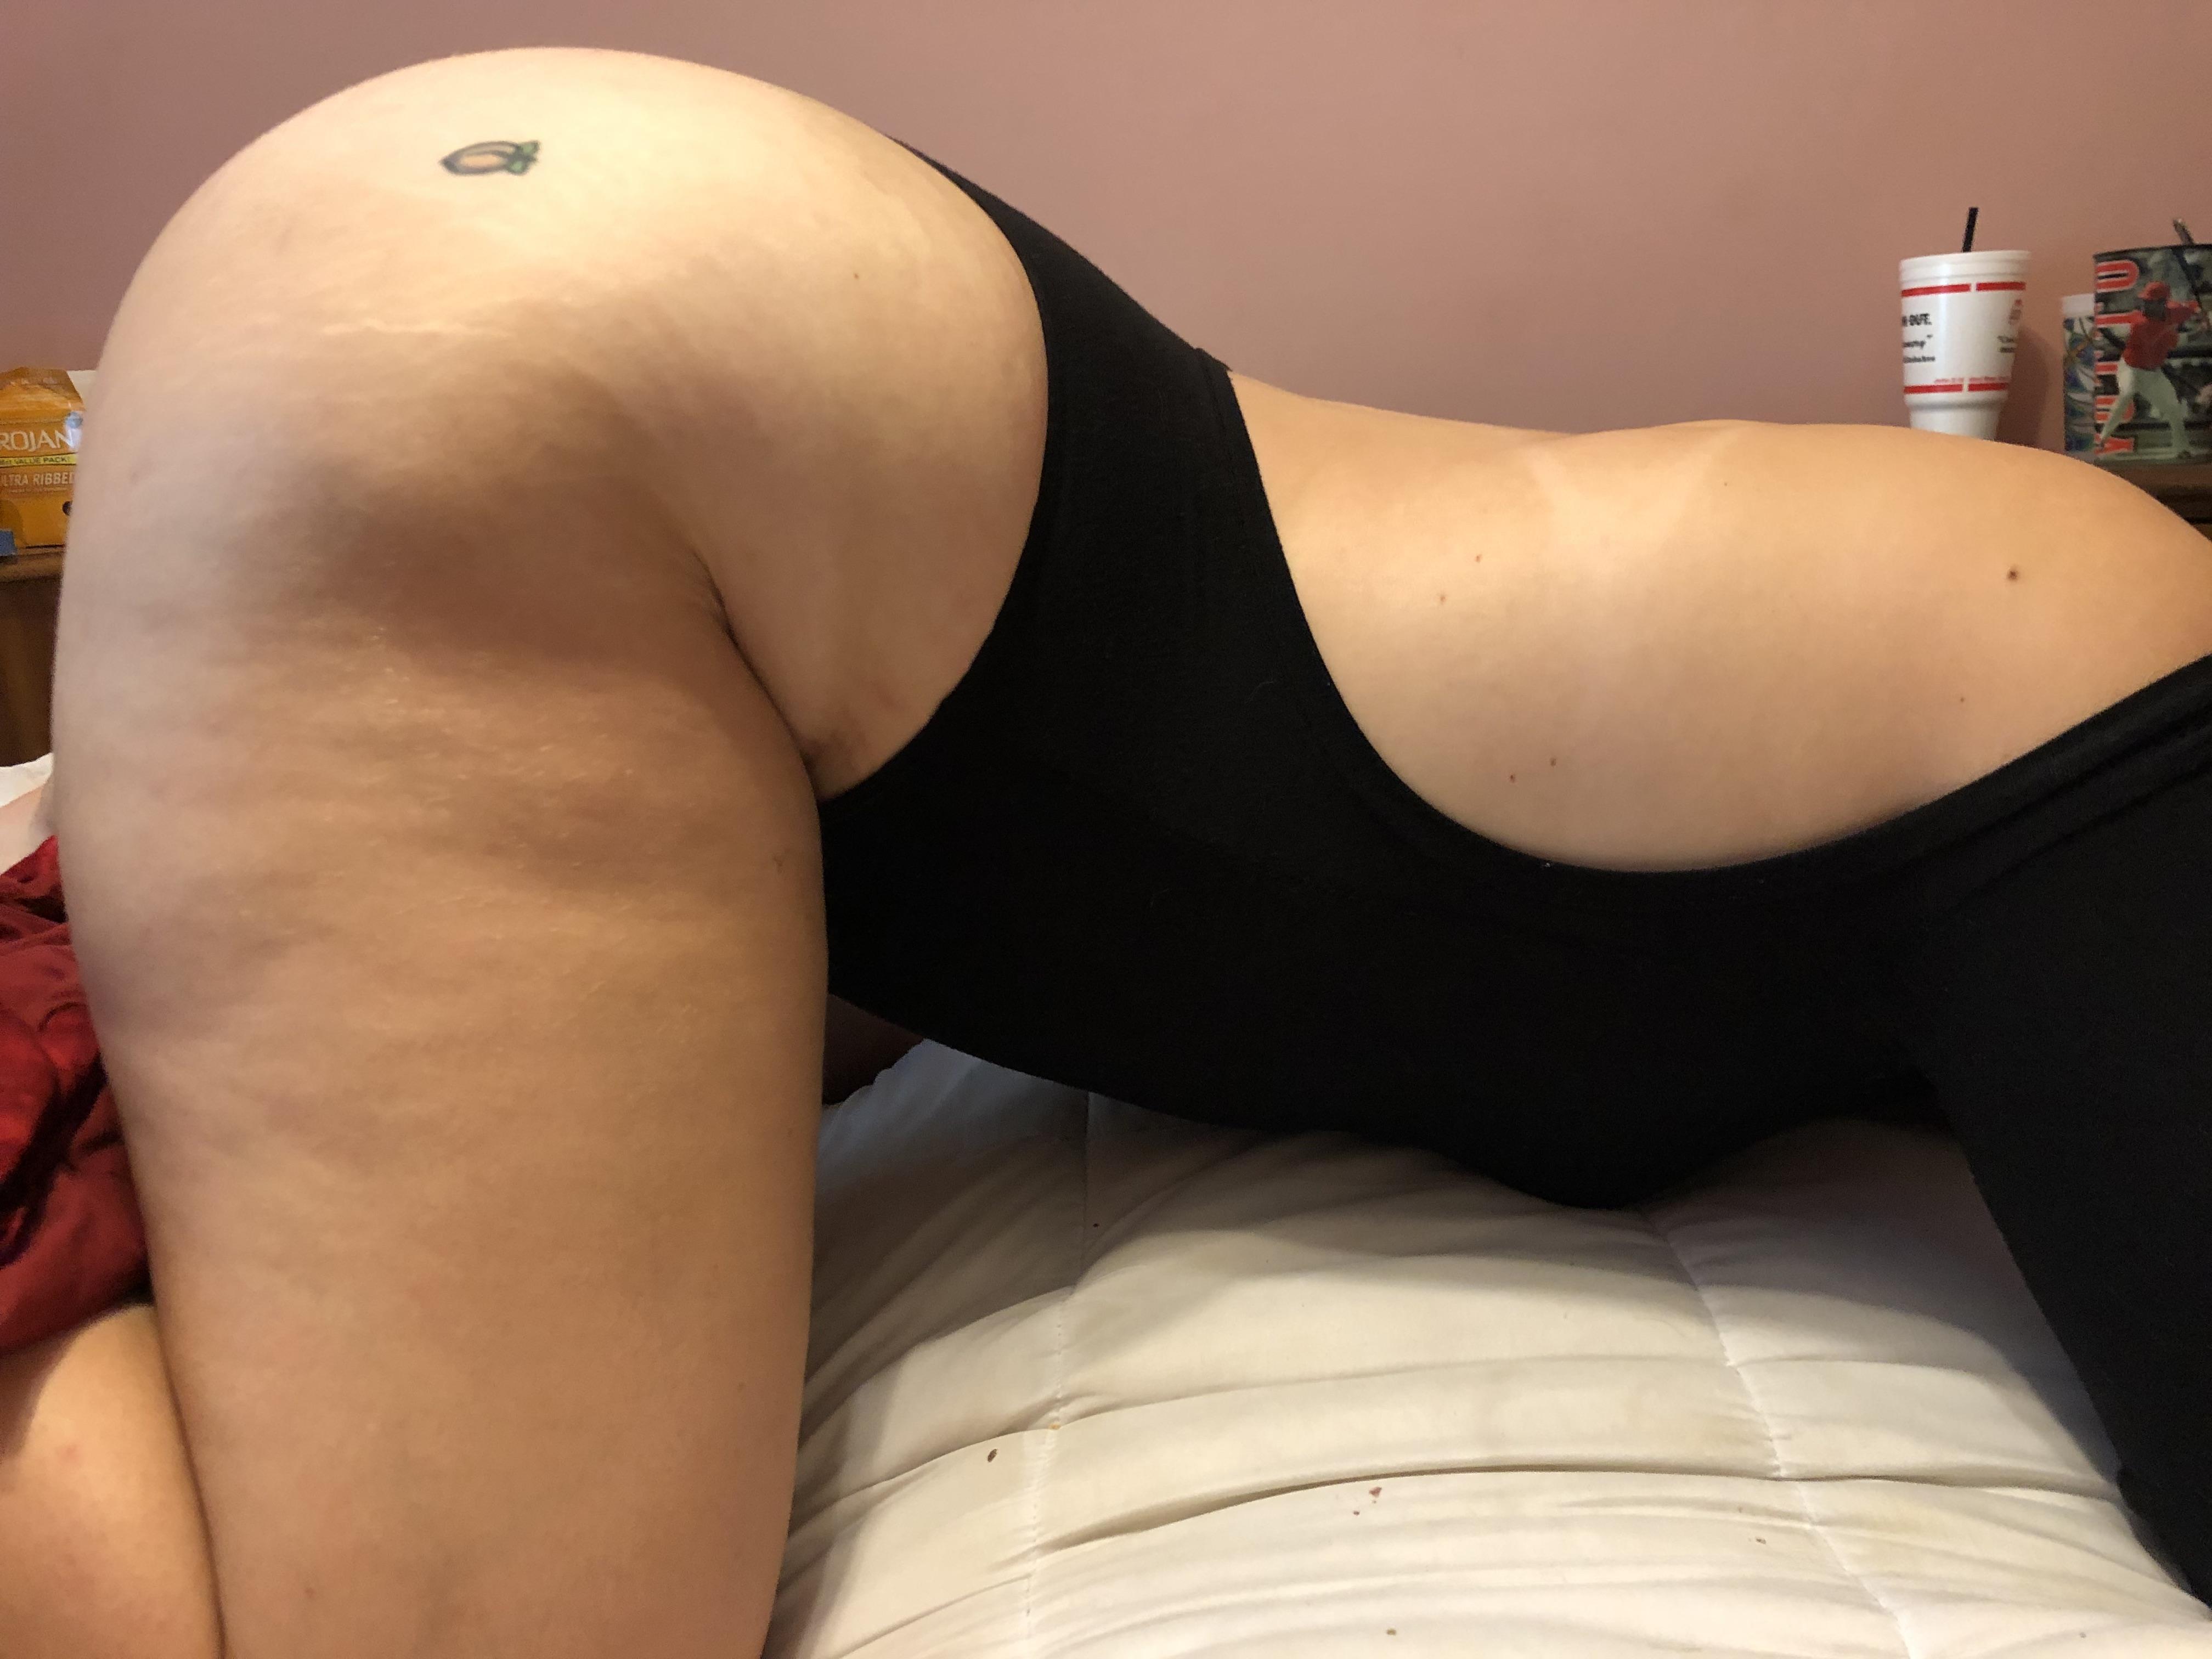 porno allblack duży penis seans